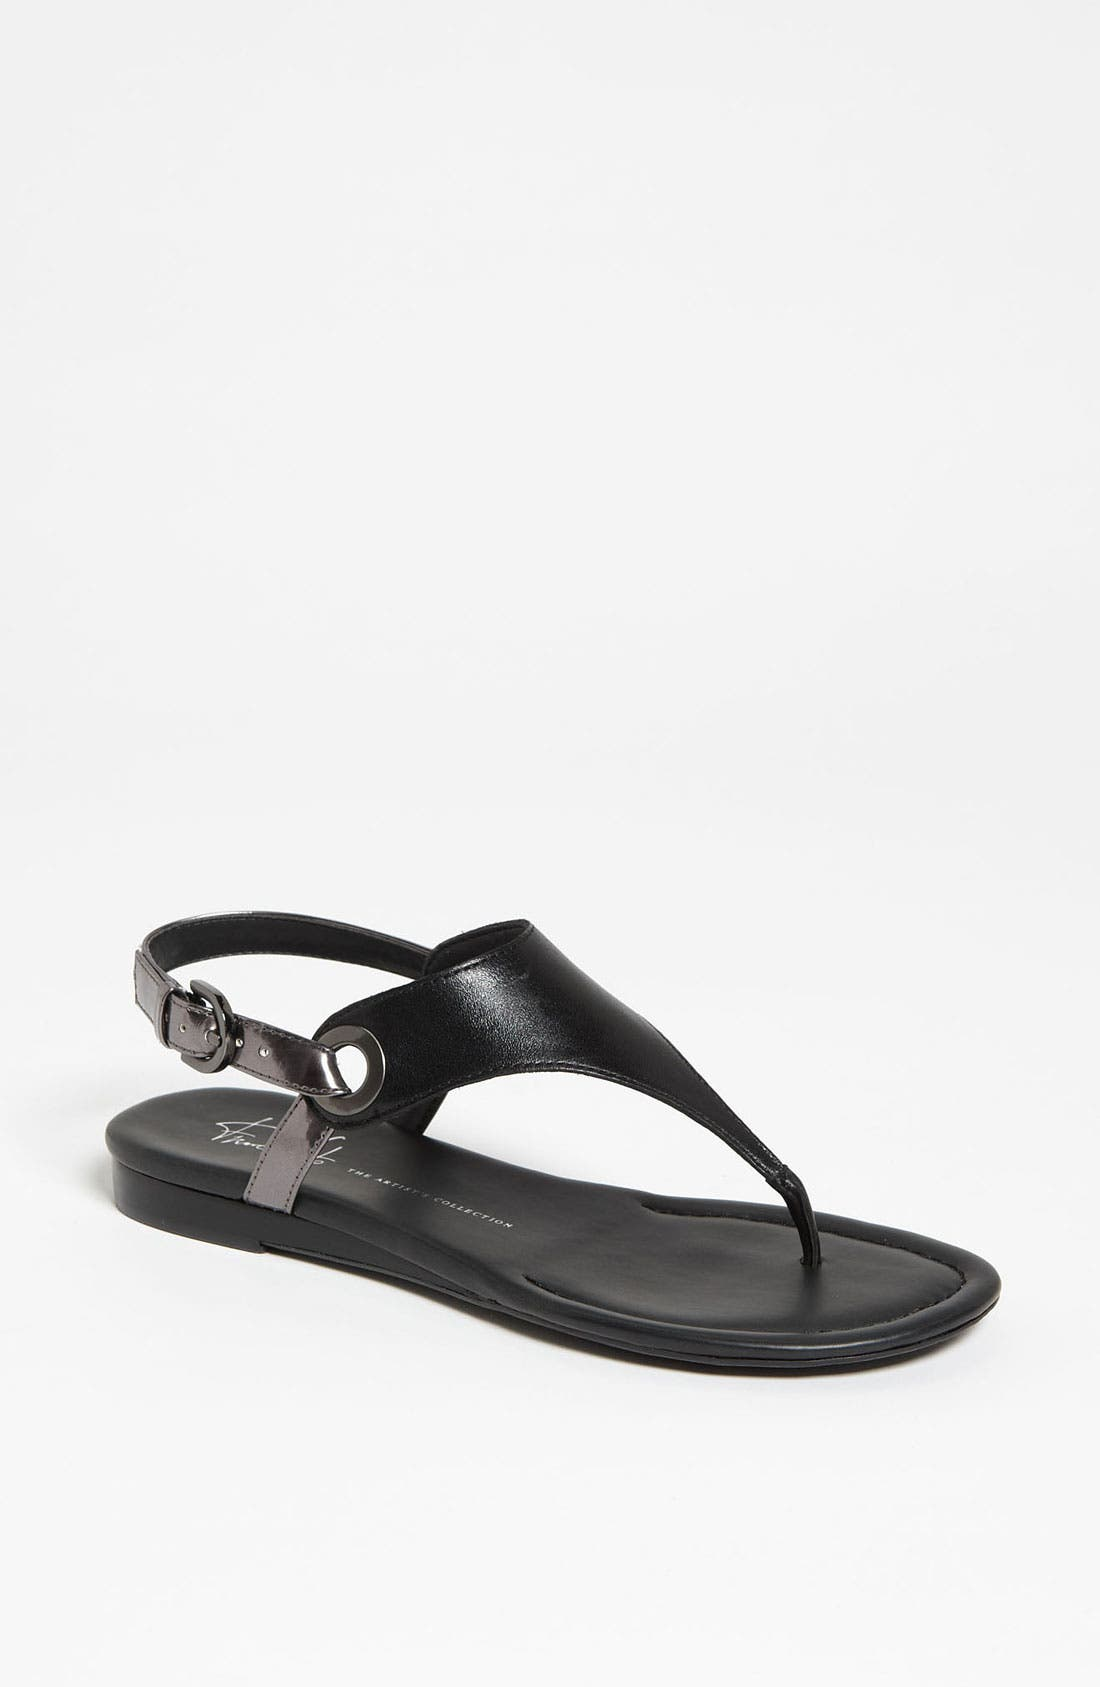 Main Image - Franco Sarto 'Grip' Sandal